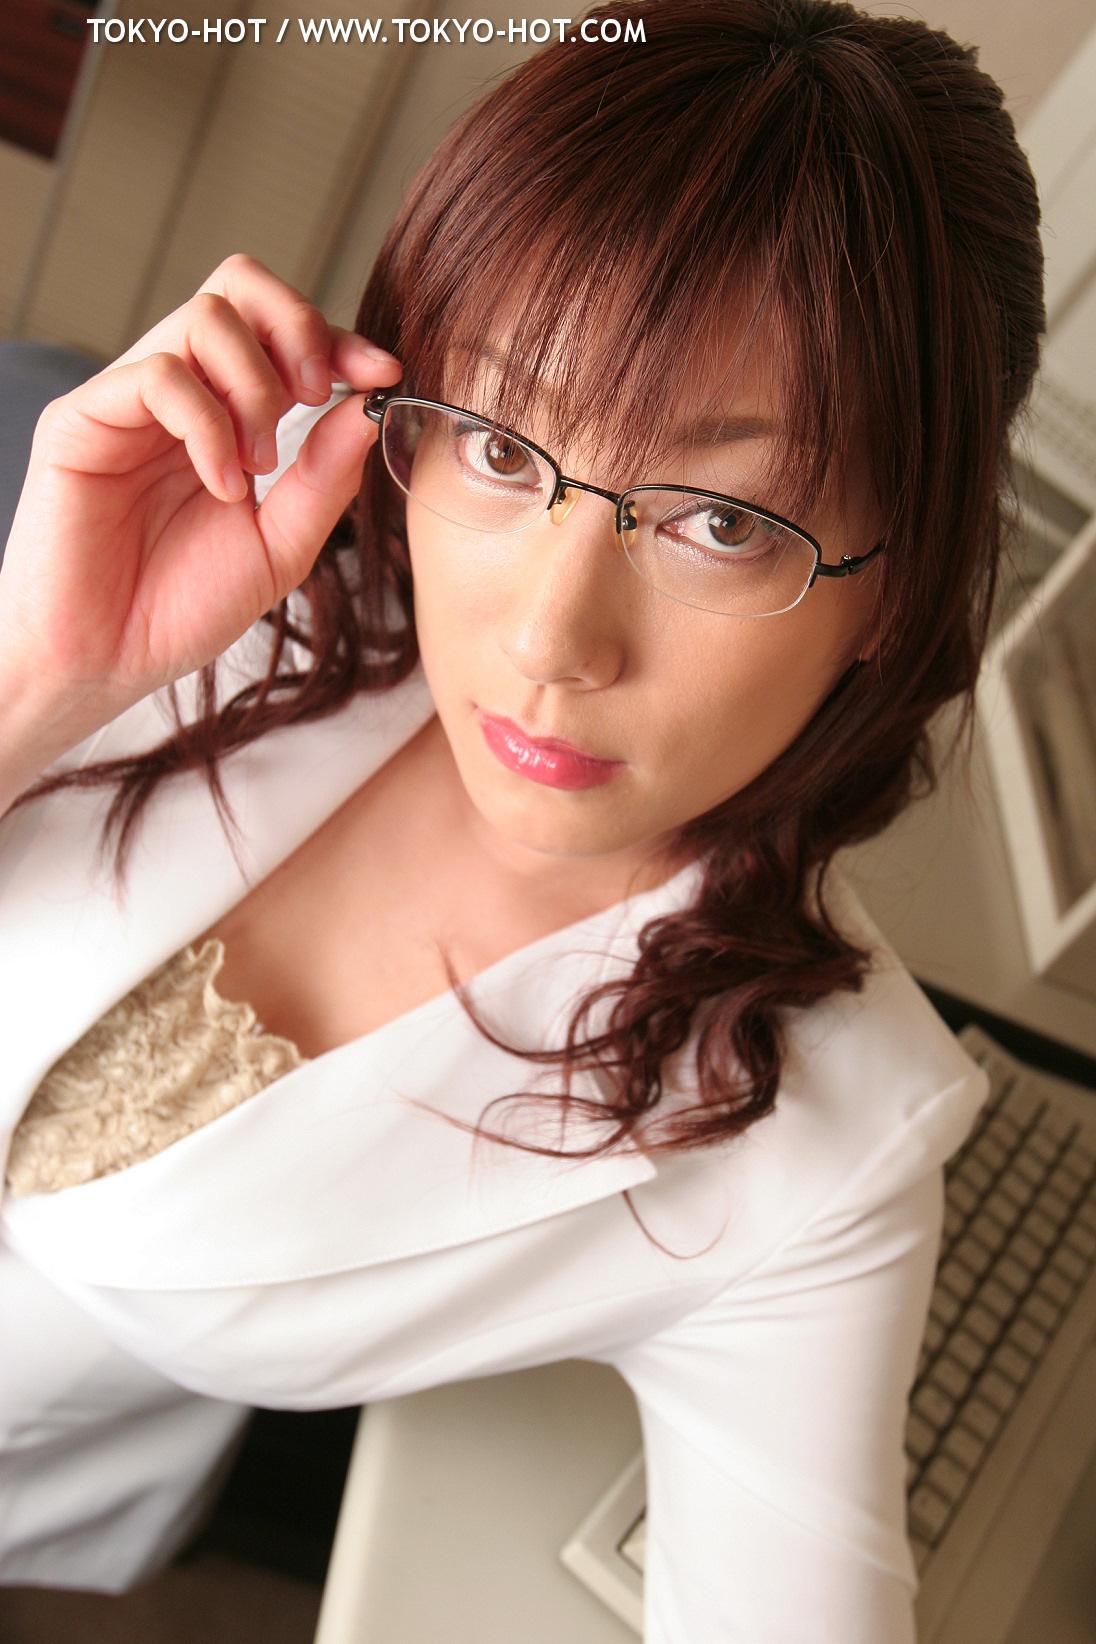 [Tokyo-Hot] e053 Megu Aso 麻生めぐ [1106P562MB]